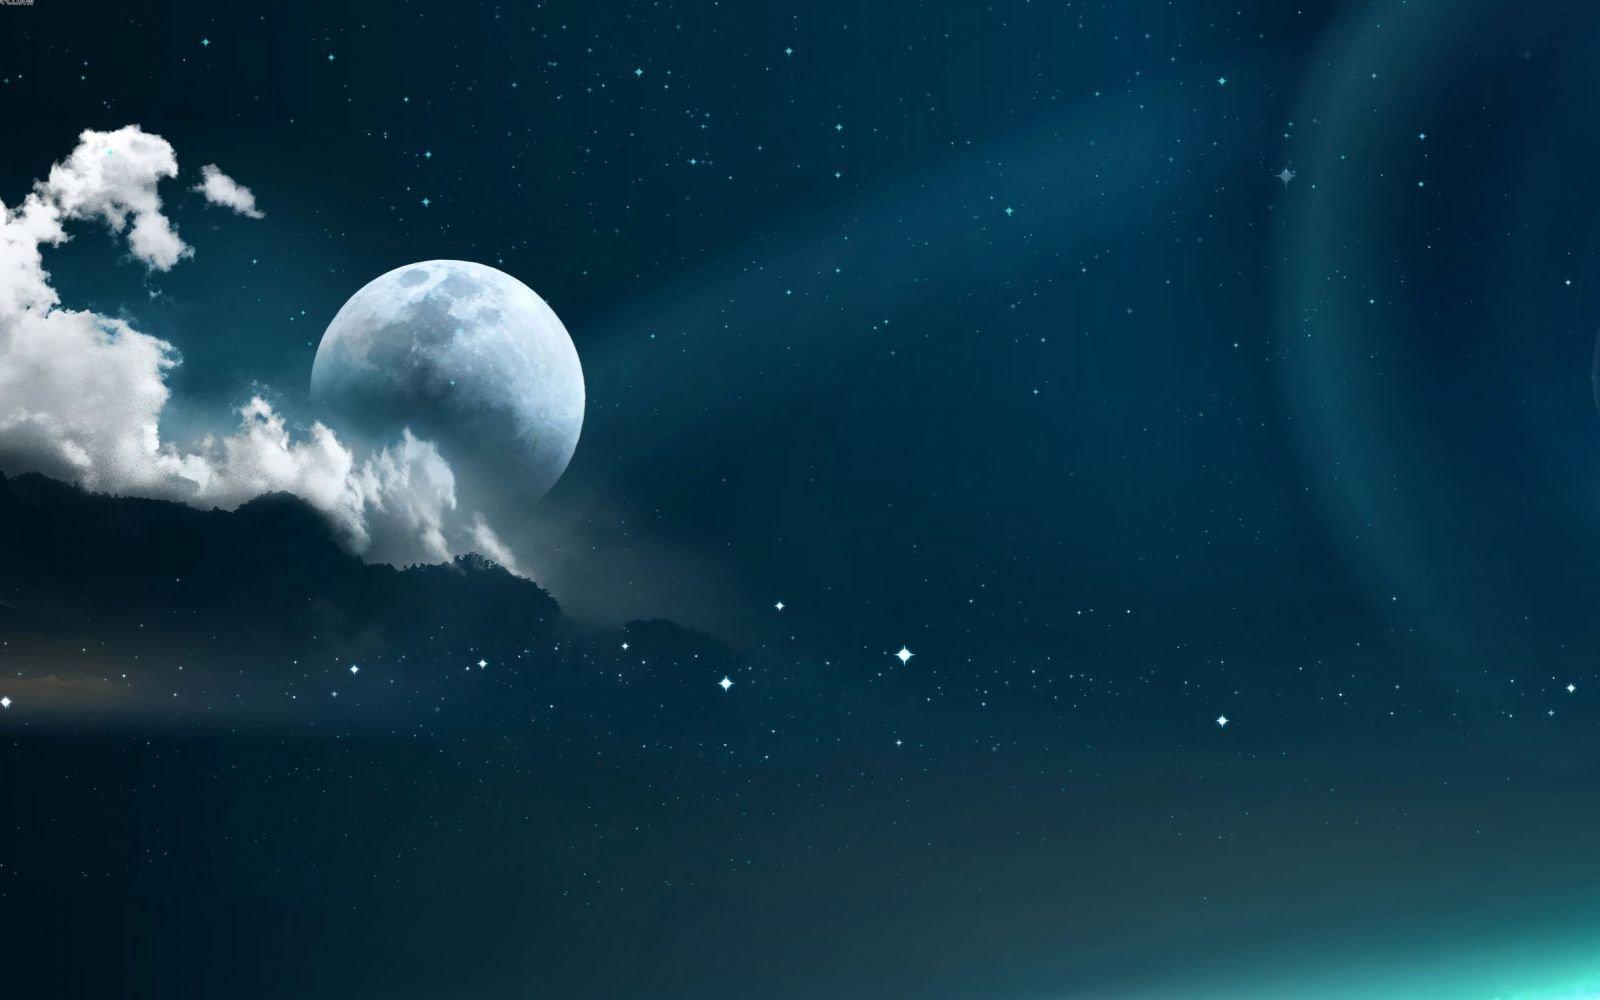 Volle maan spell